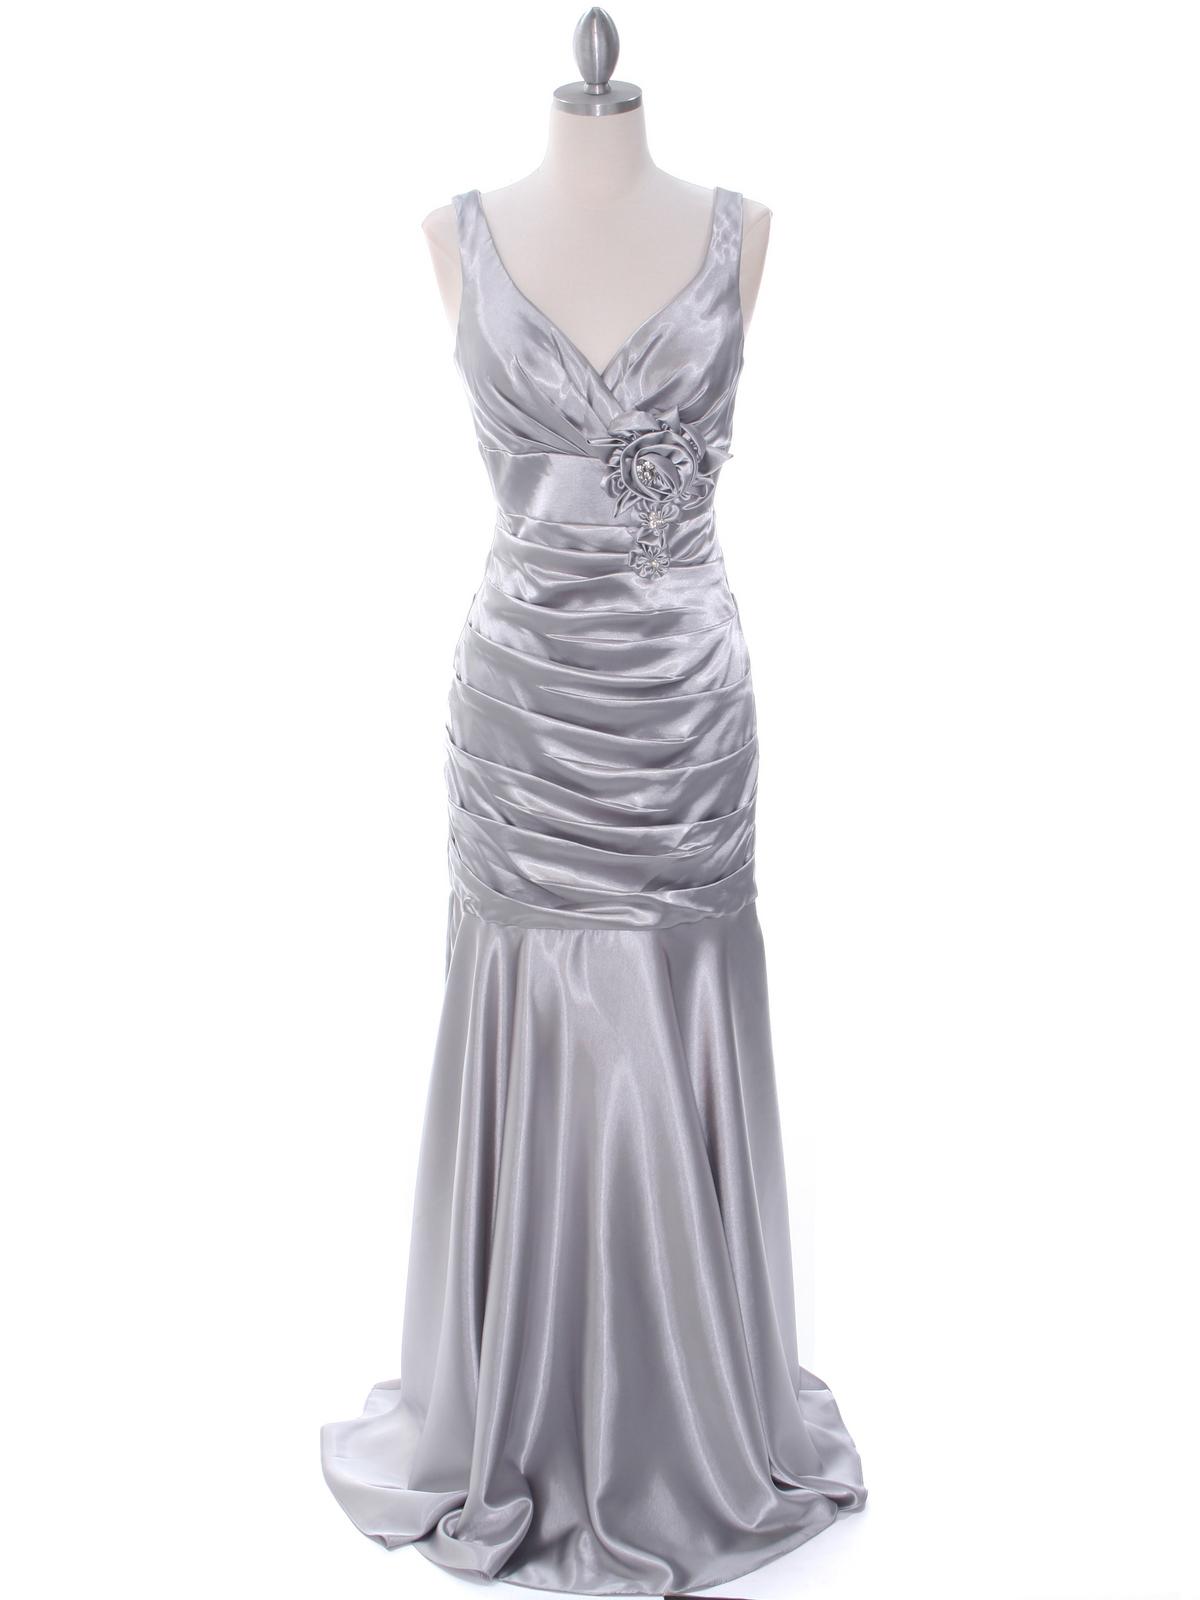 Silver bridesmaid dress sung boutique la 5098 silver bridesmaid dress silver front view medium ombrellifo Choice Image